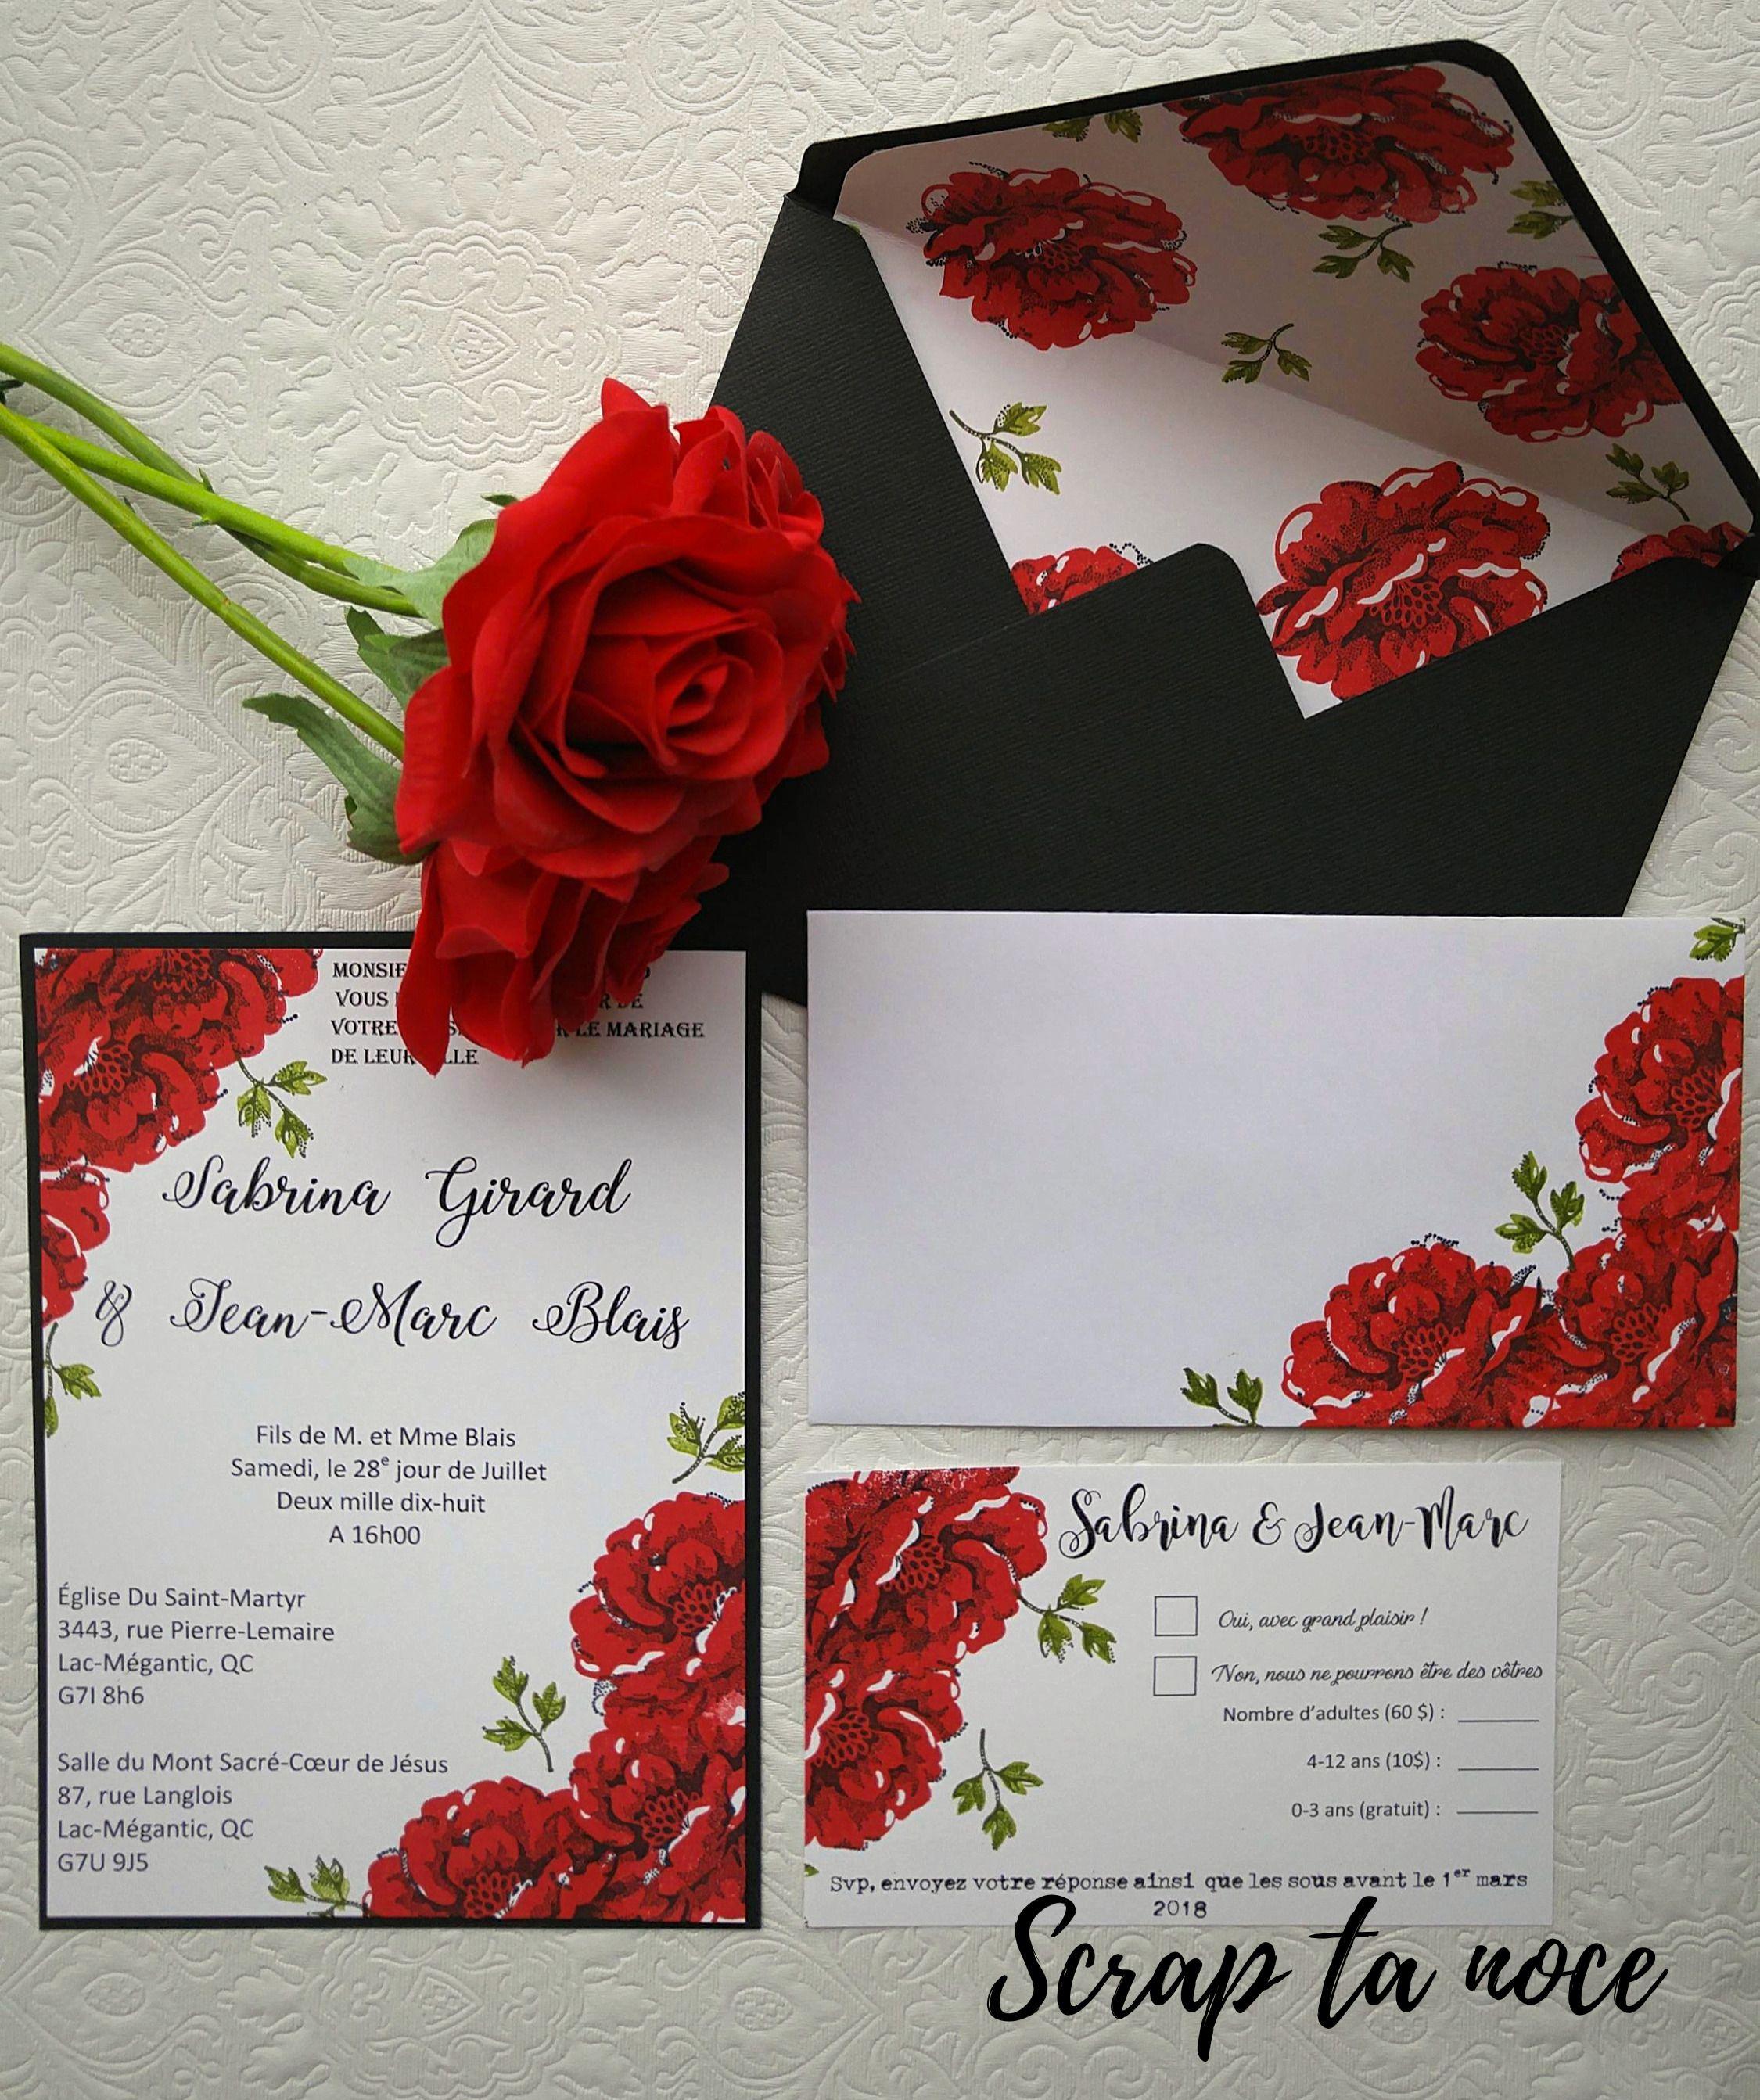 Wedding Roses Invitations Faire Part De Mariage Avec Roses Rouges Wedding Etsy